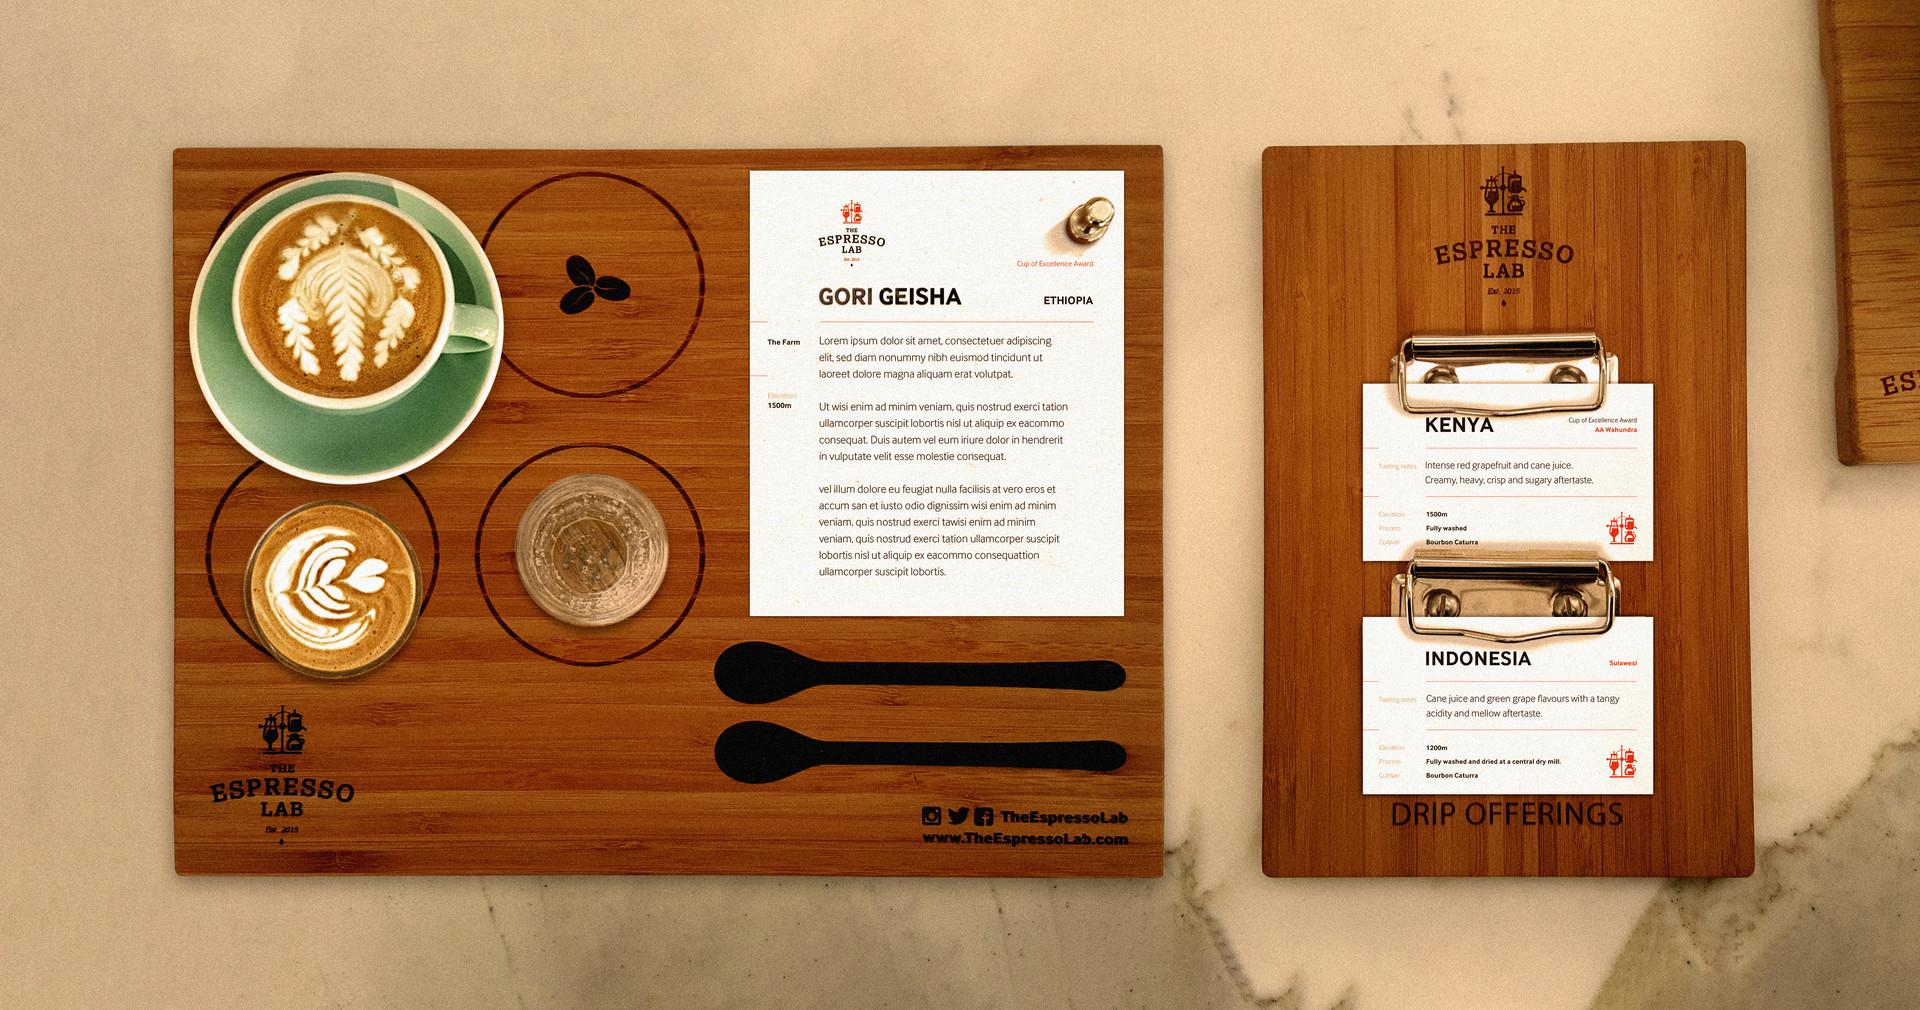 06 TLL Coffee Card and Board 1.jpg